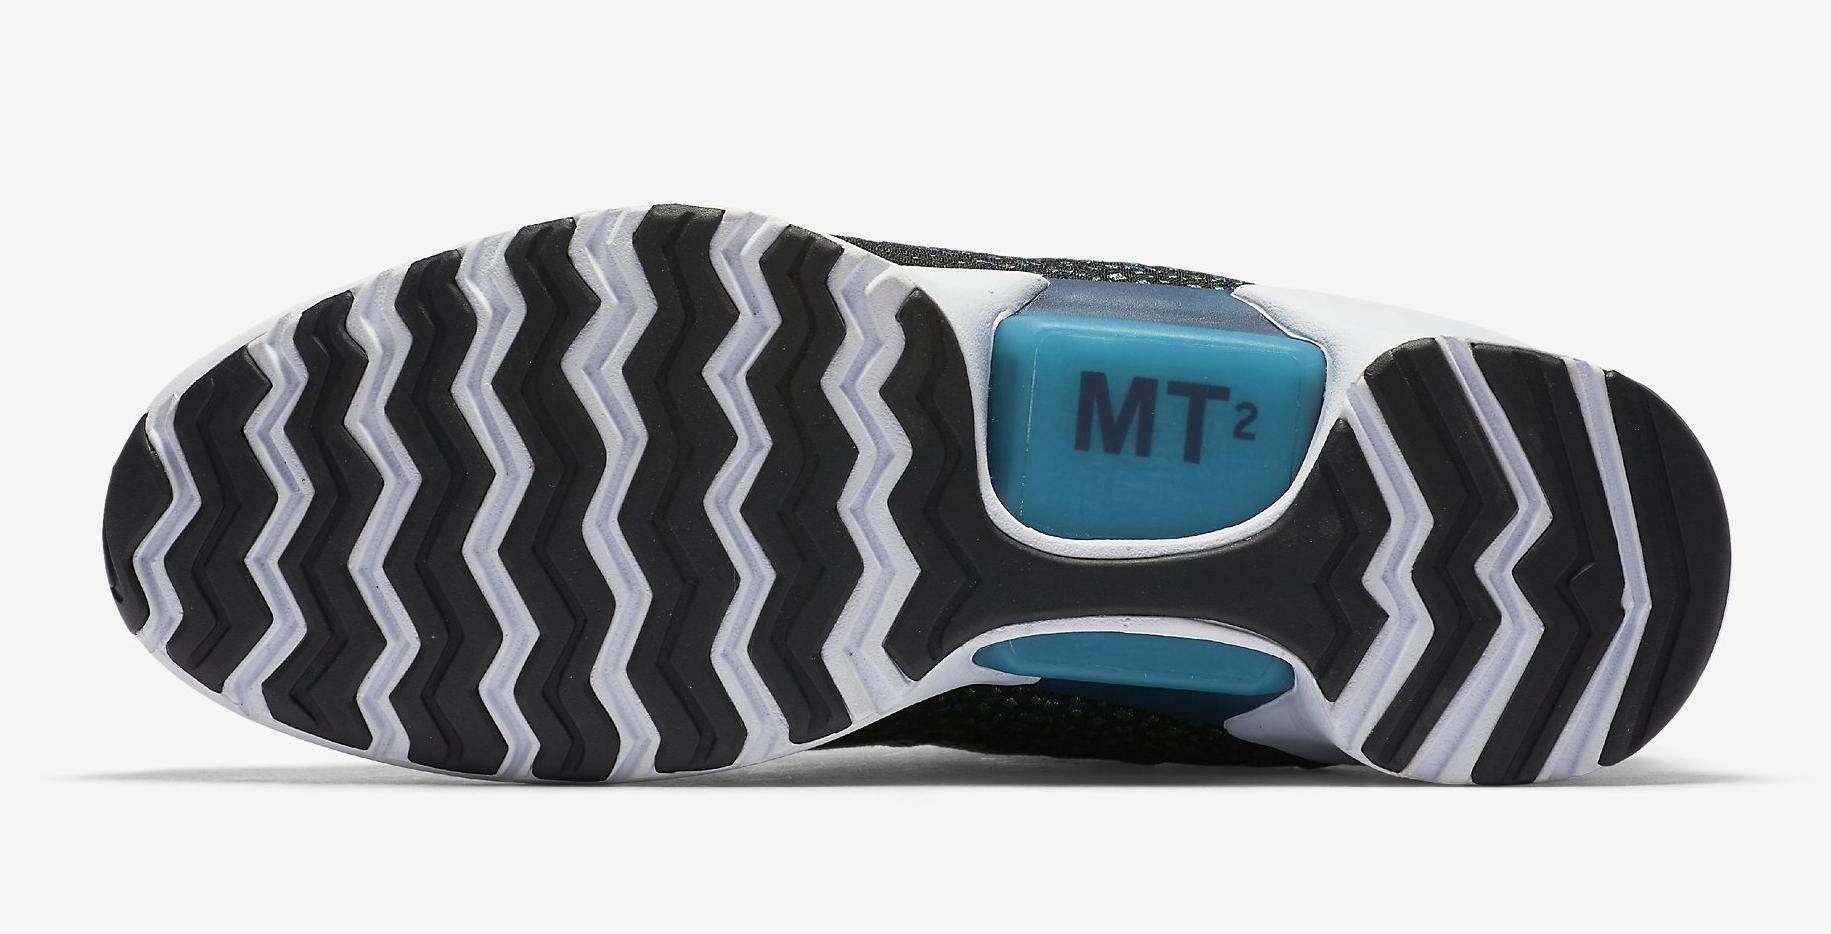 Nike Hyperadapt 843871-001 Sole